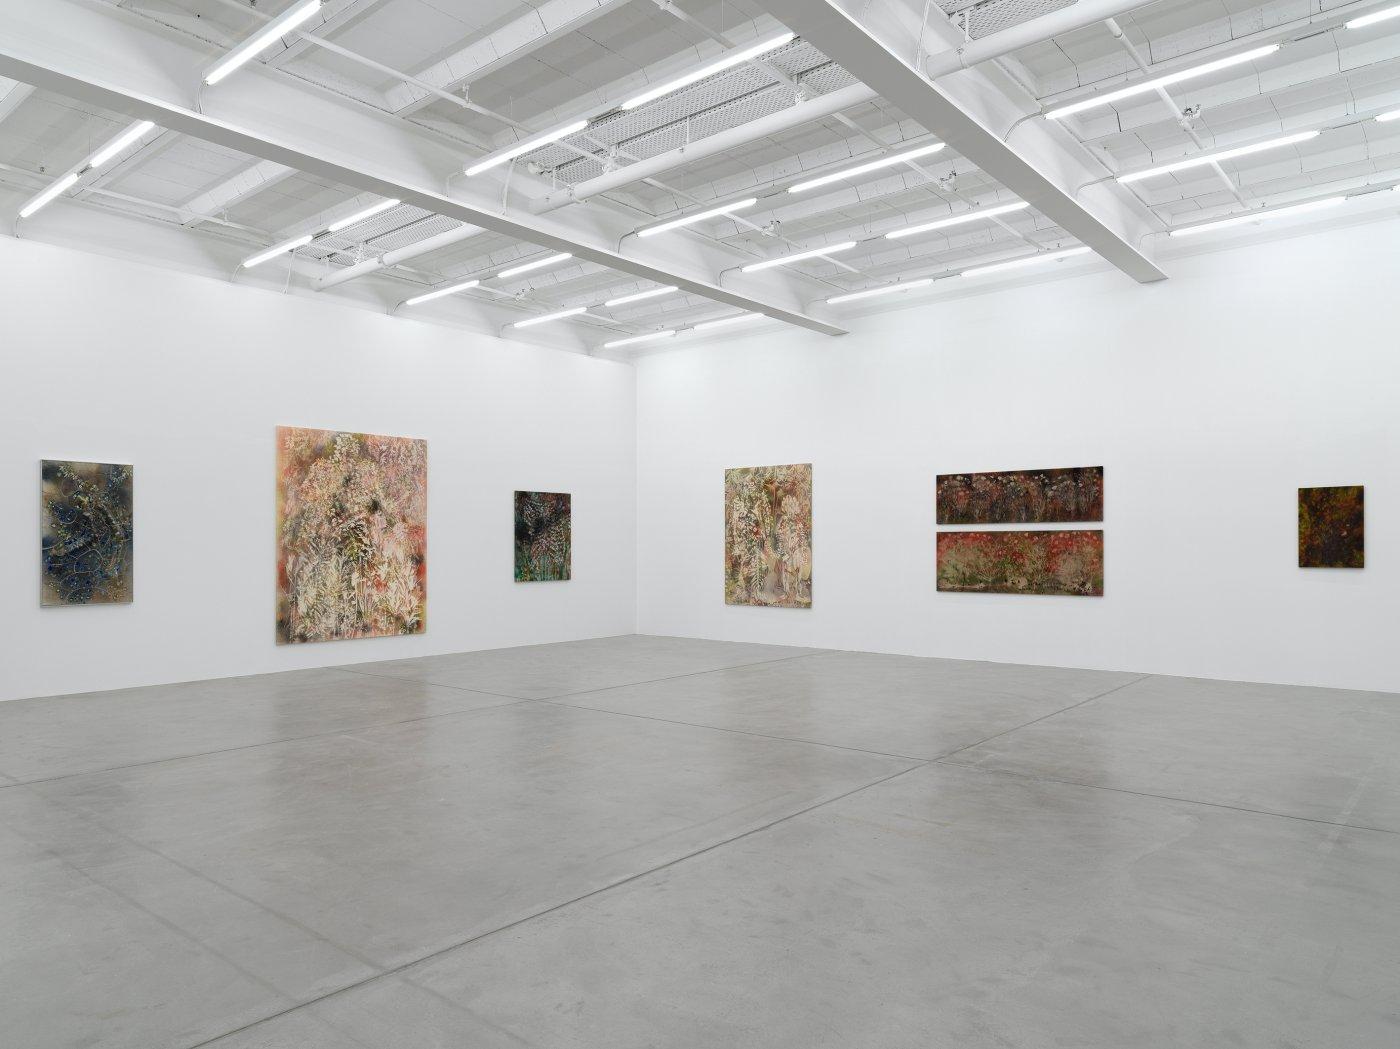 Galerie Eva Presenhuber Maag Areal Sam Falls 9